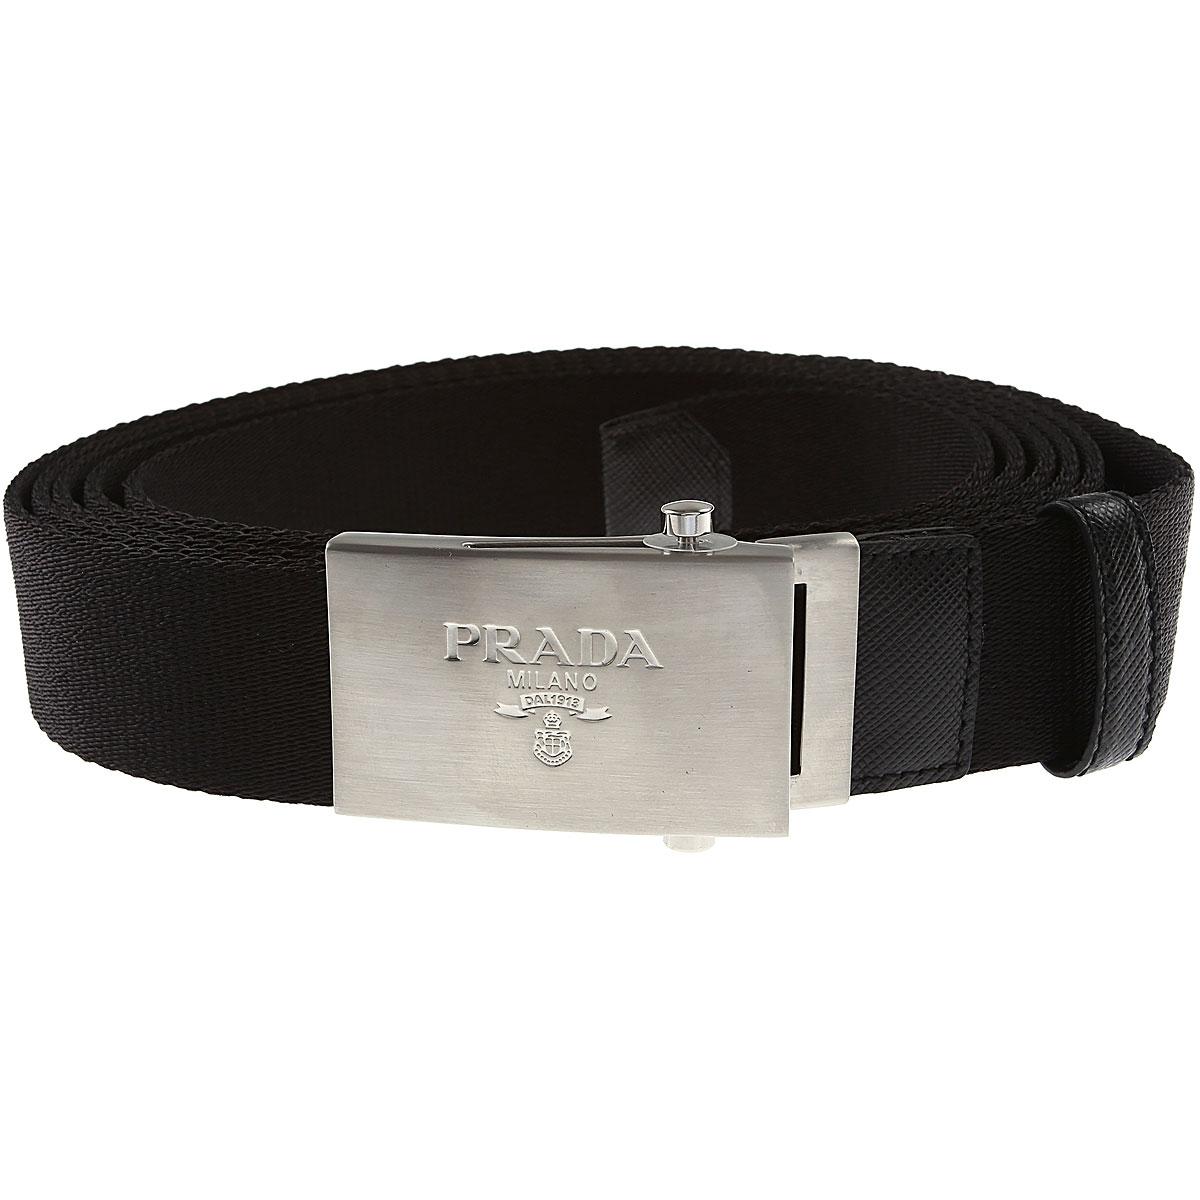 Prada Belts On Sale, Black, Fabric, 2019, 32 34 36 38 40